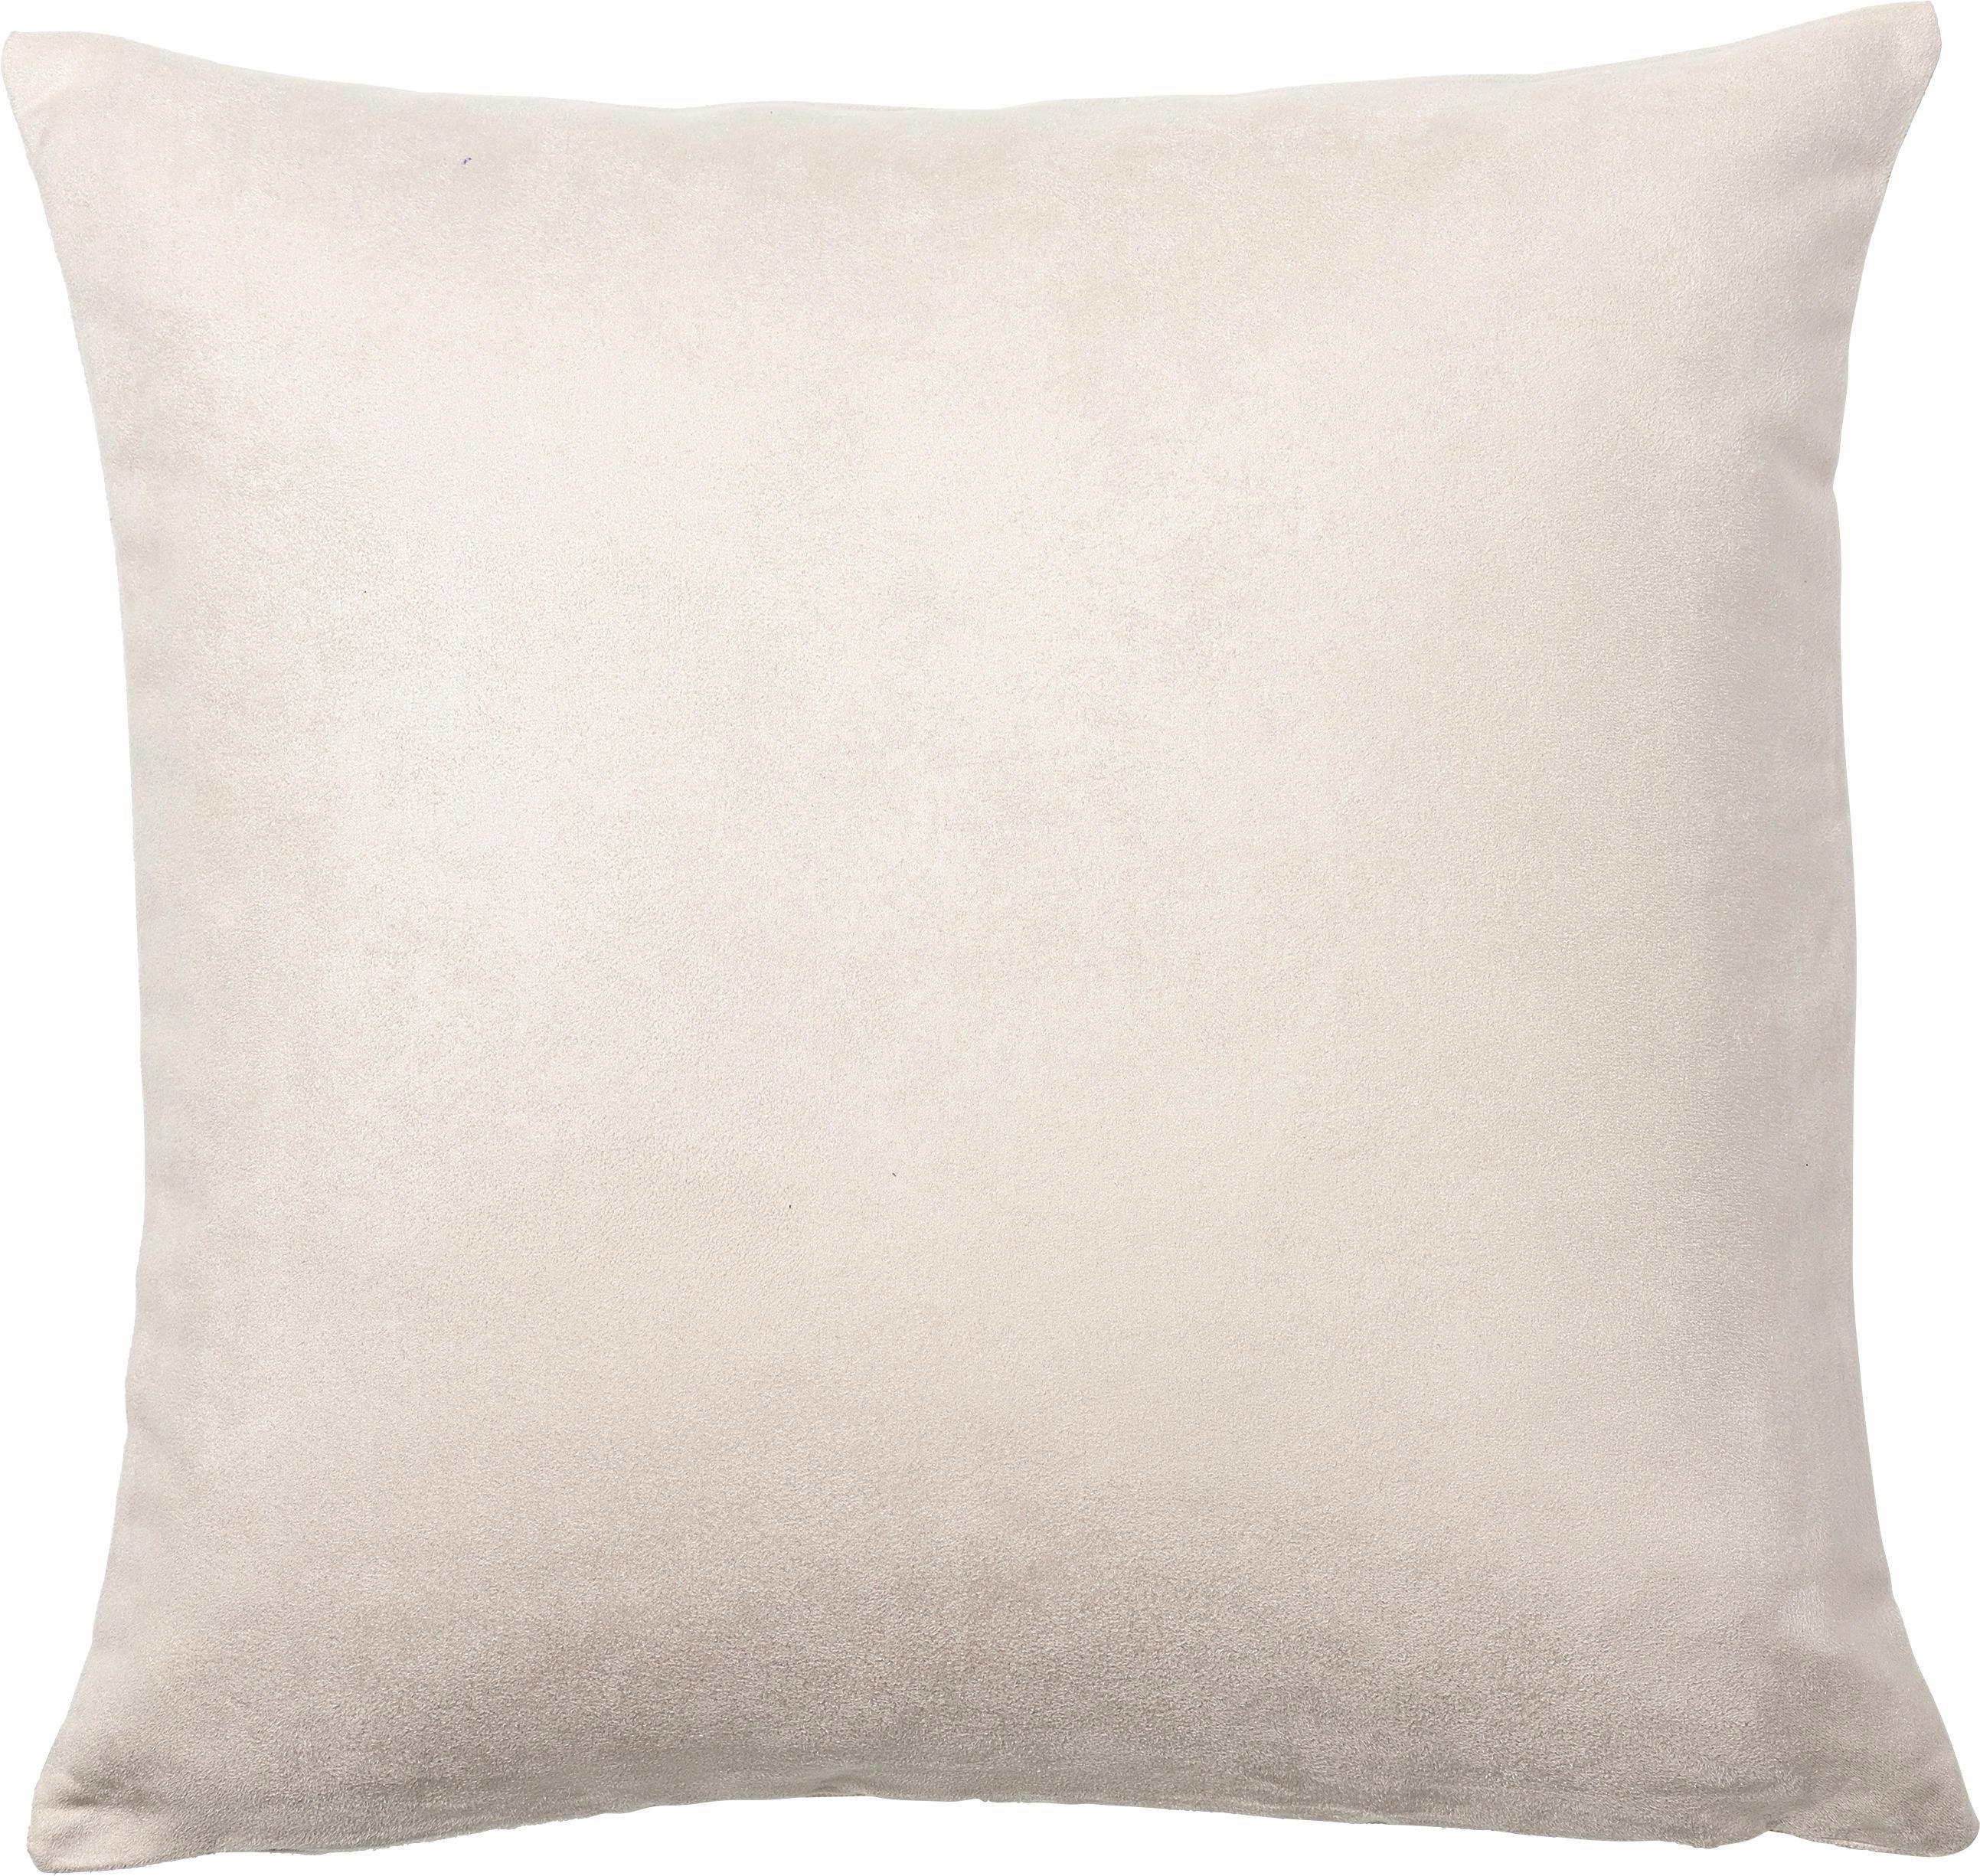 KUDDFODRAL - creme, Basics, textil (40/40cm) - NOVEL